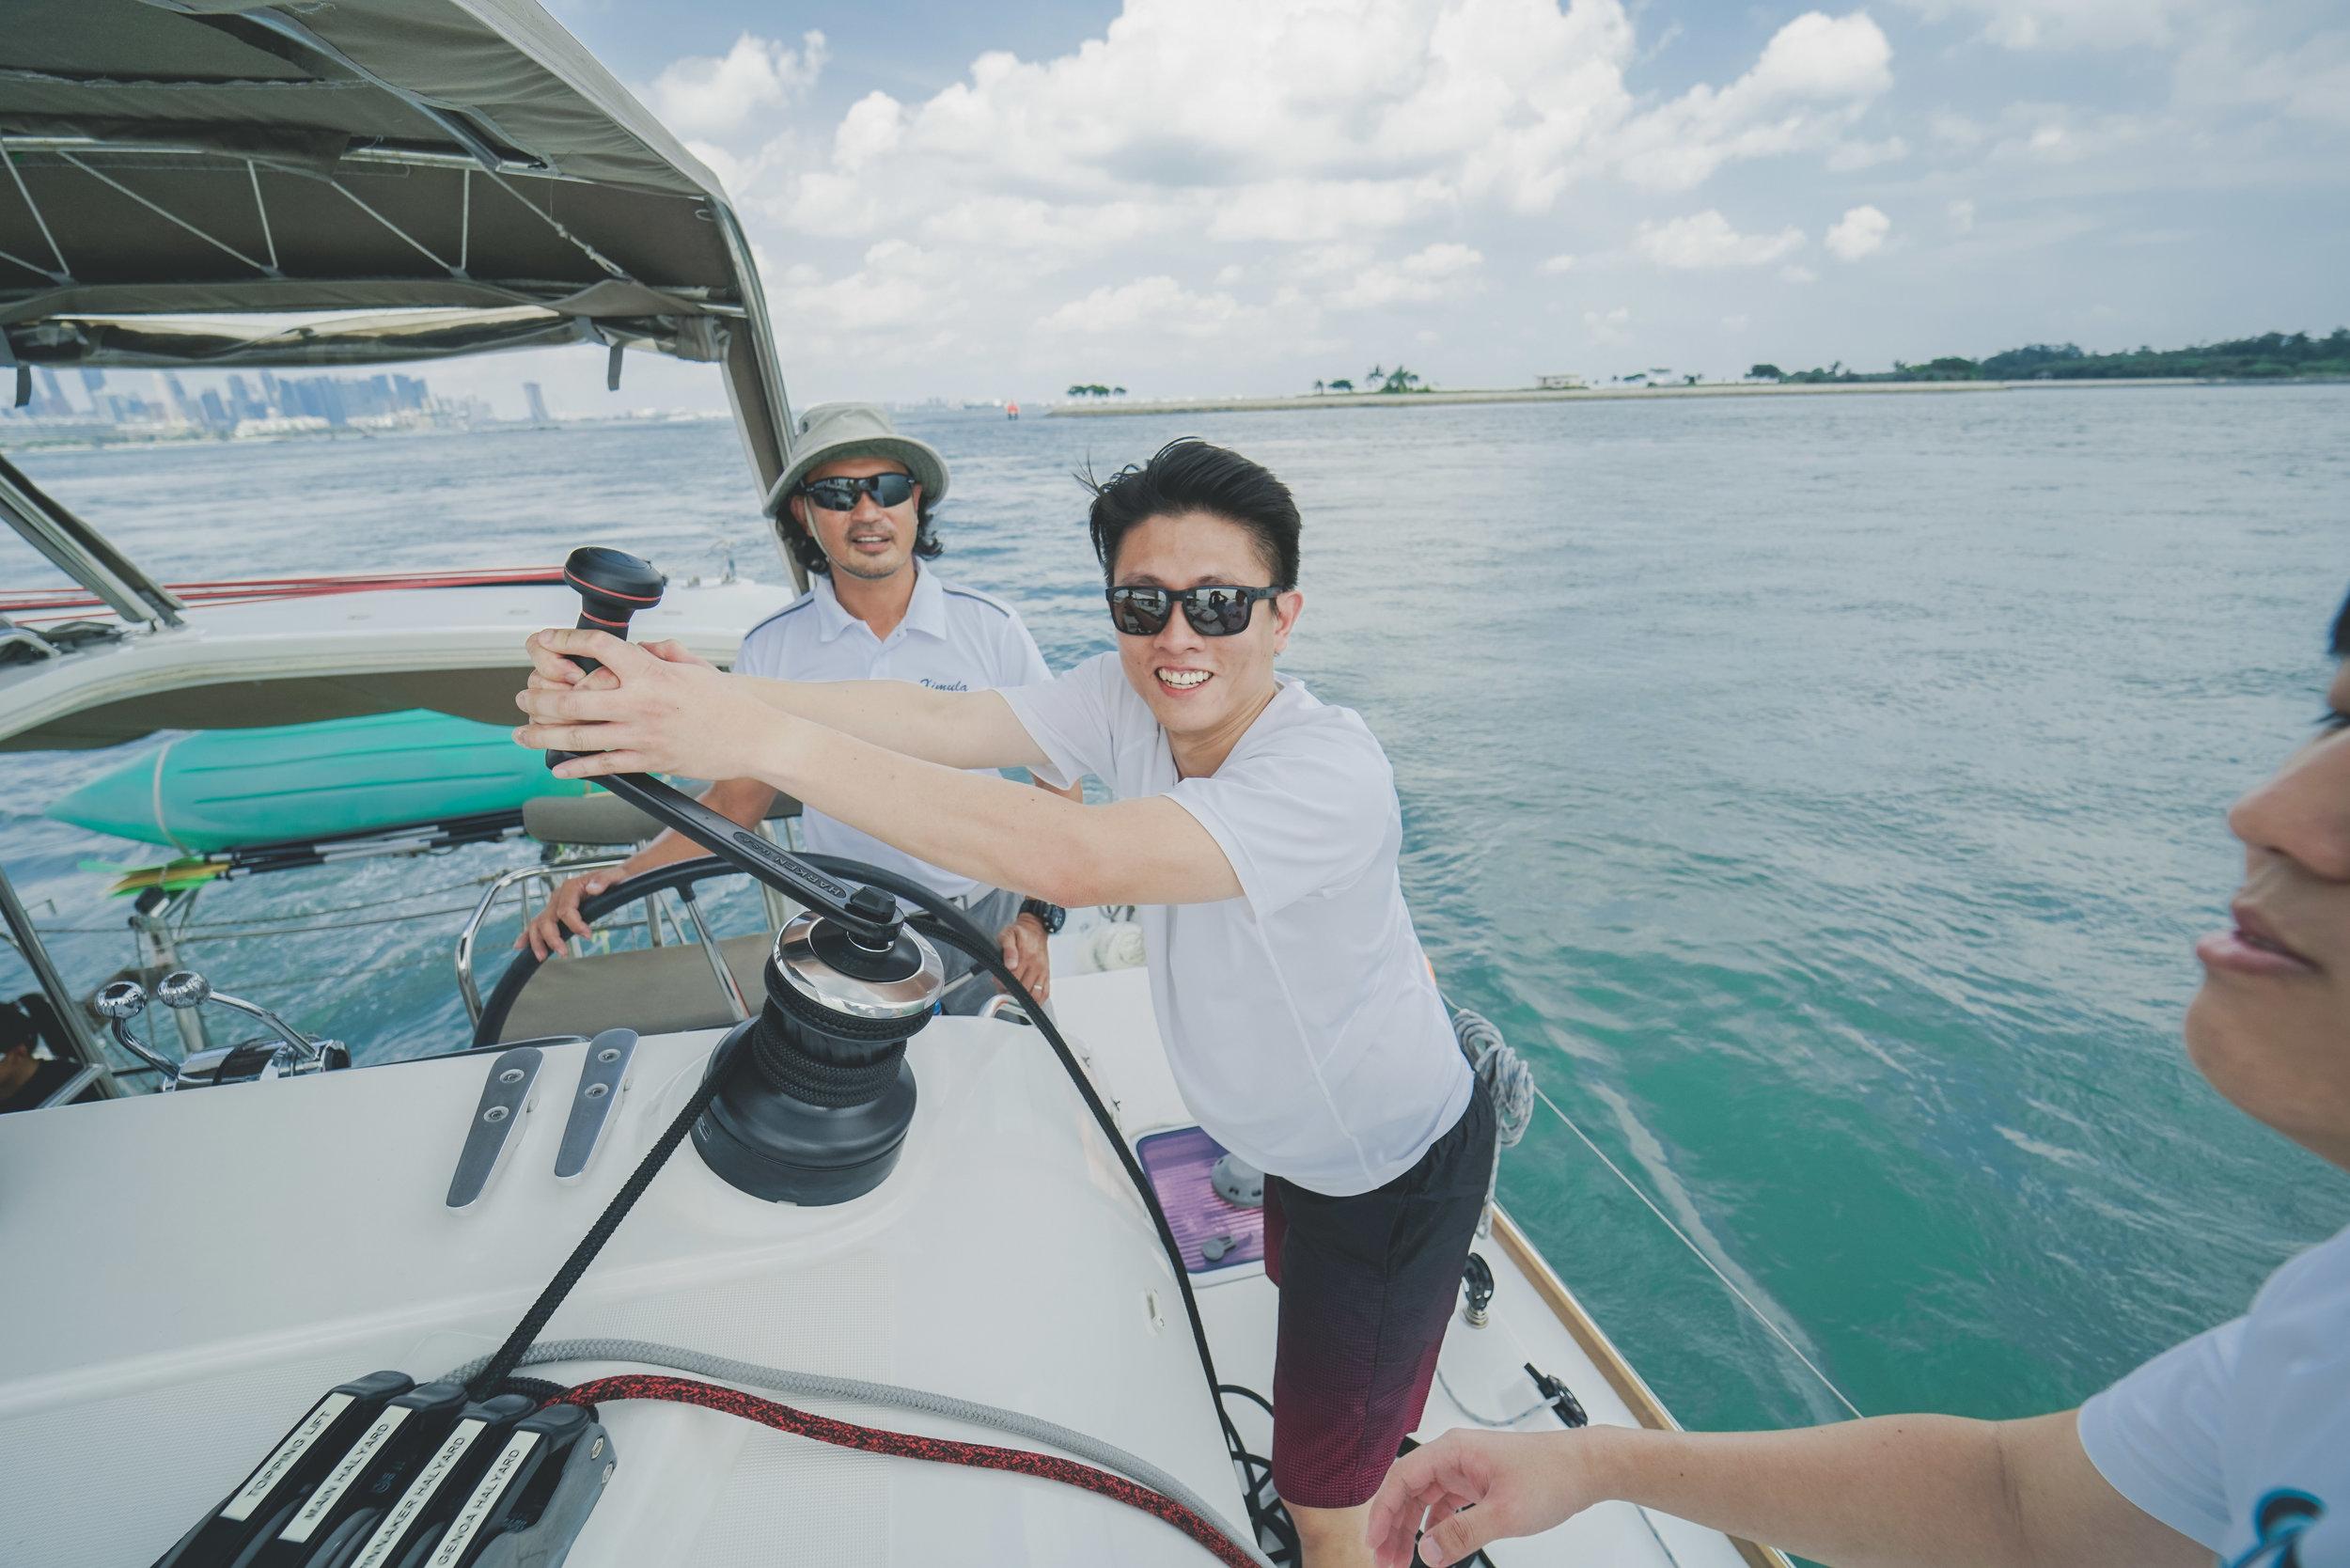 Ximula experiential sailing-1028.jpg